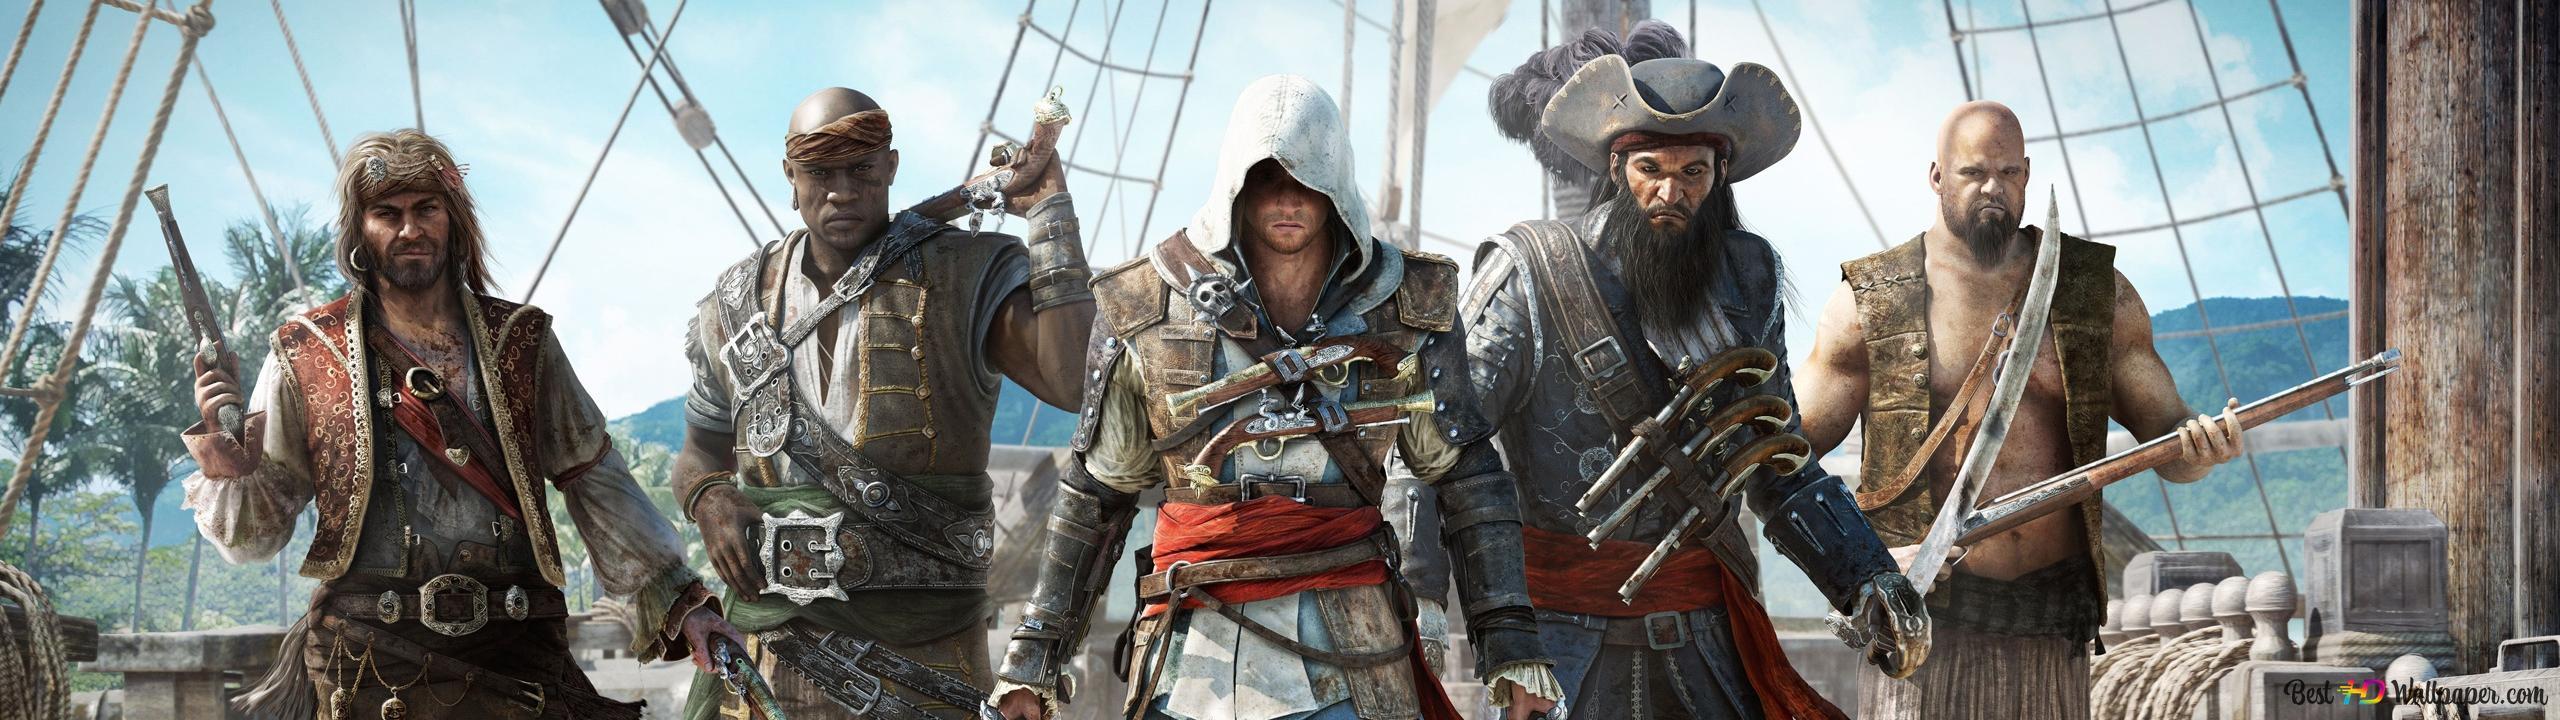 Assassin S Creed Iv Black Flag Hd Wallpaper Download